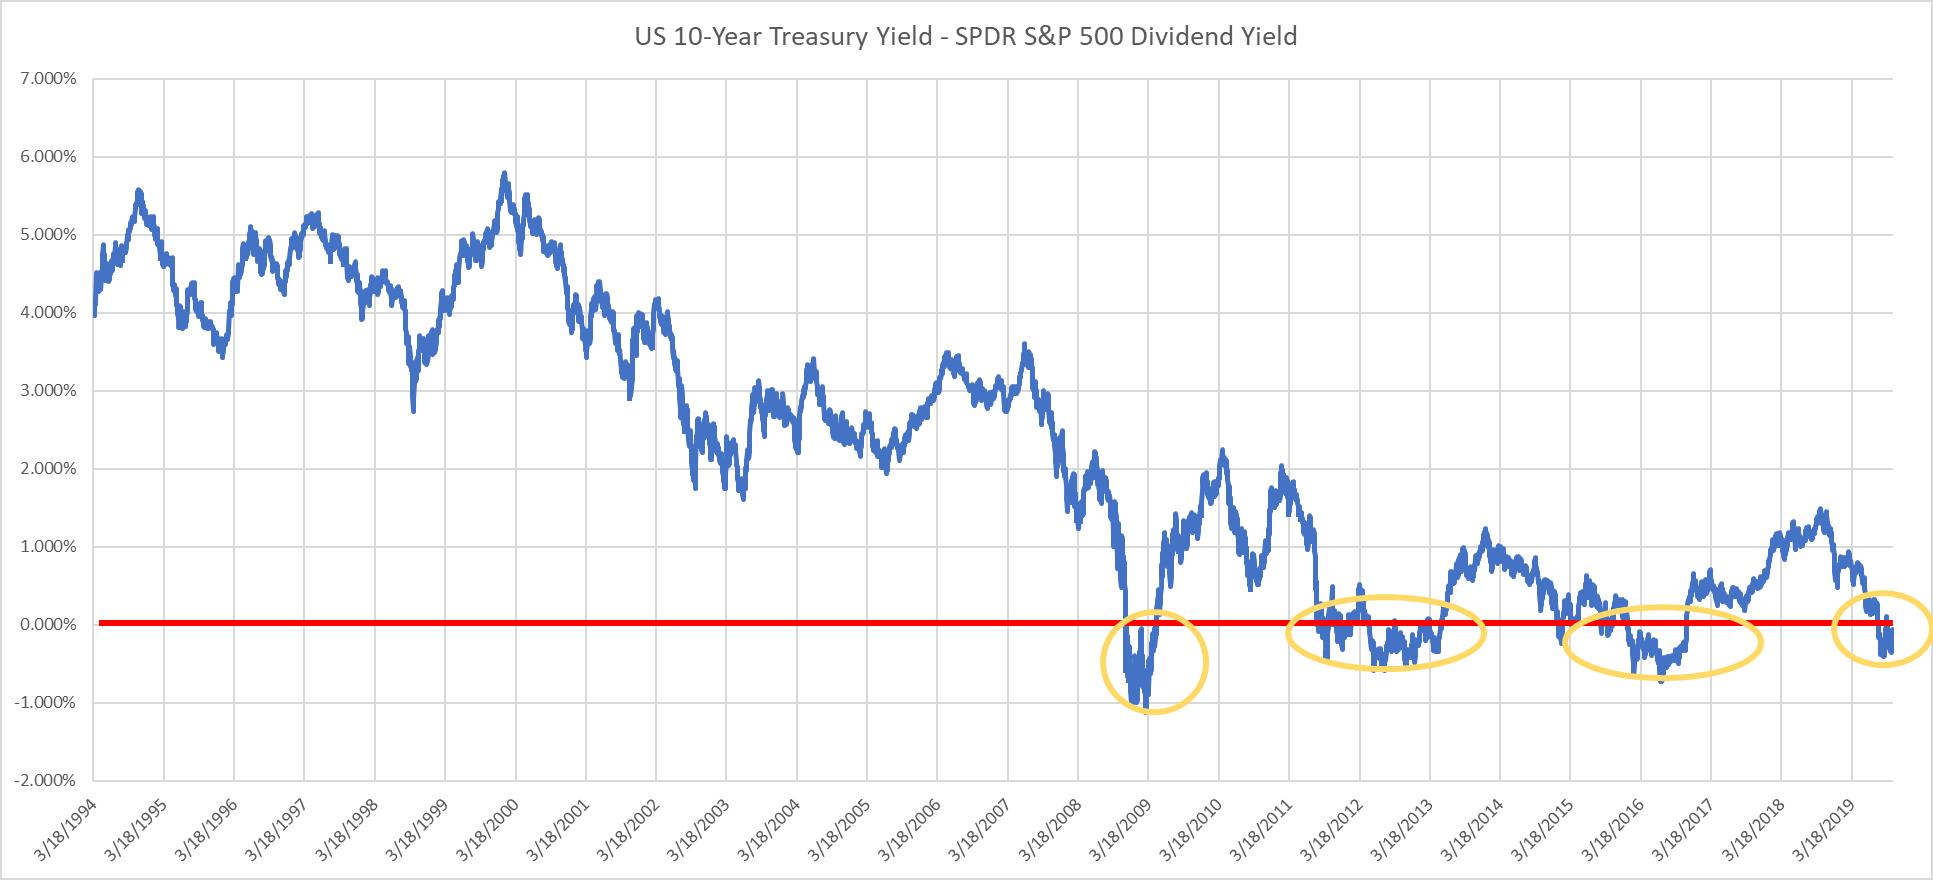 Rendimento do título de 10 anos e do ETF de dividendos do S&P 500